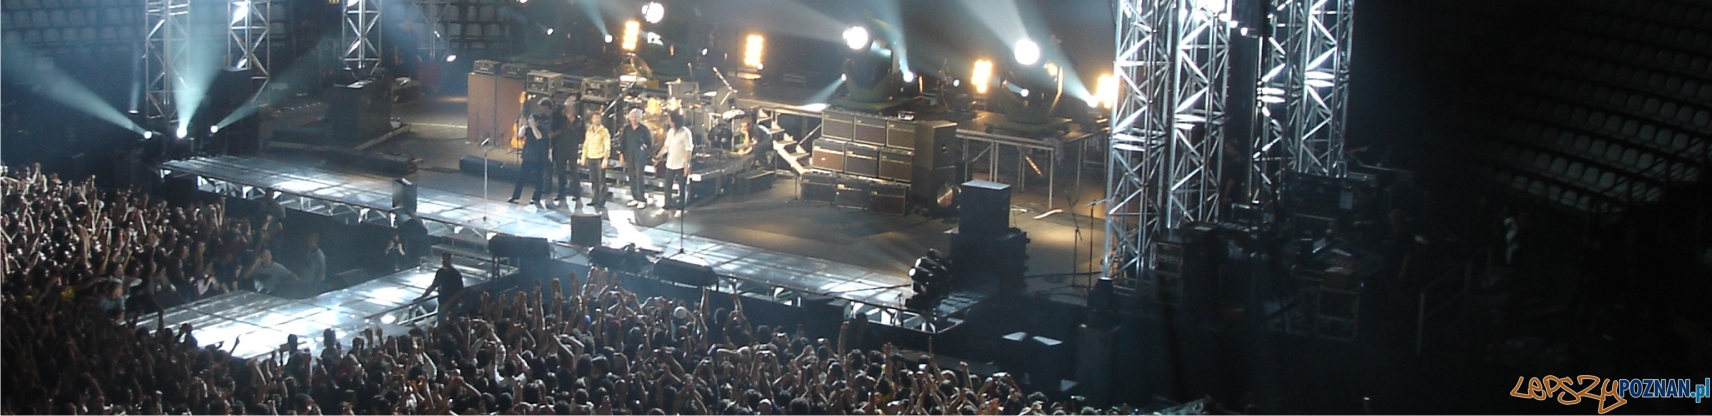 panorama koncert  Foto: sxc